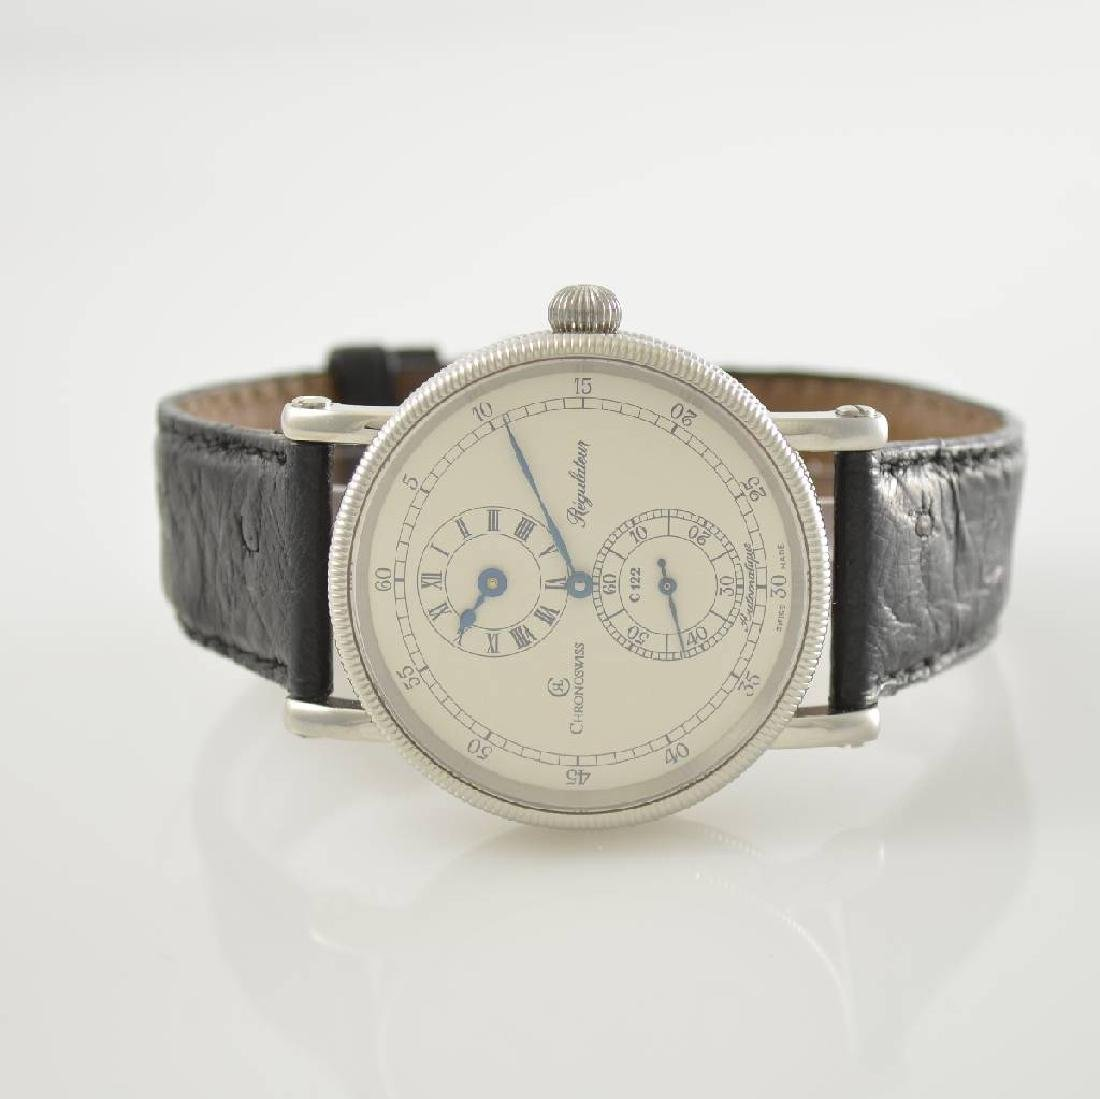 CHRONOSWISS Regulateur gents wristwatch